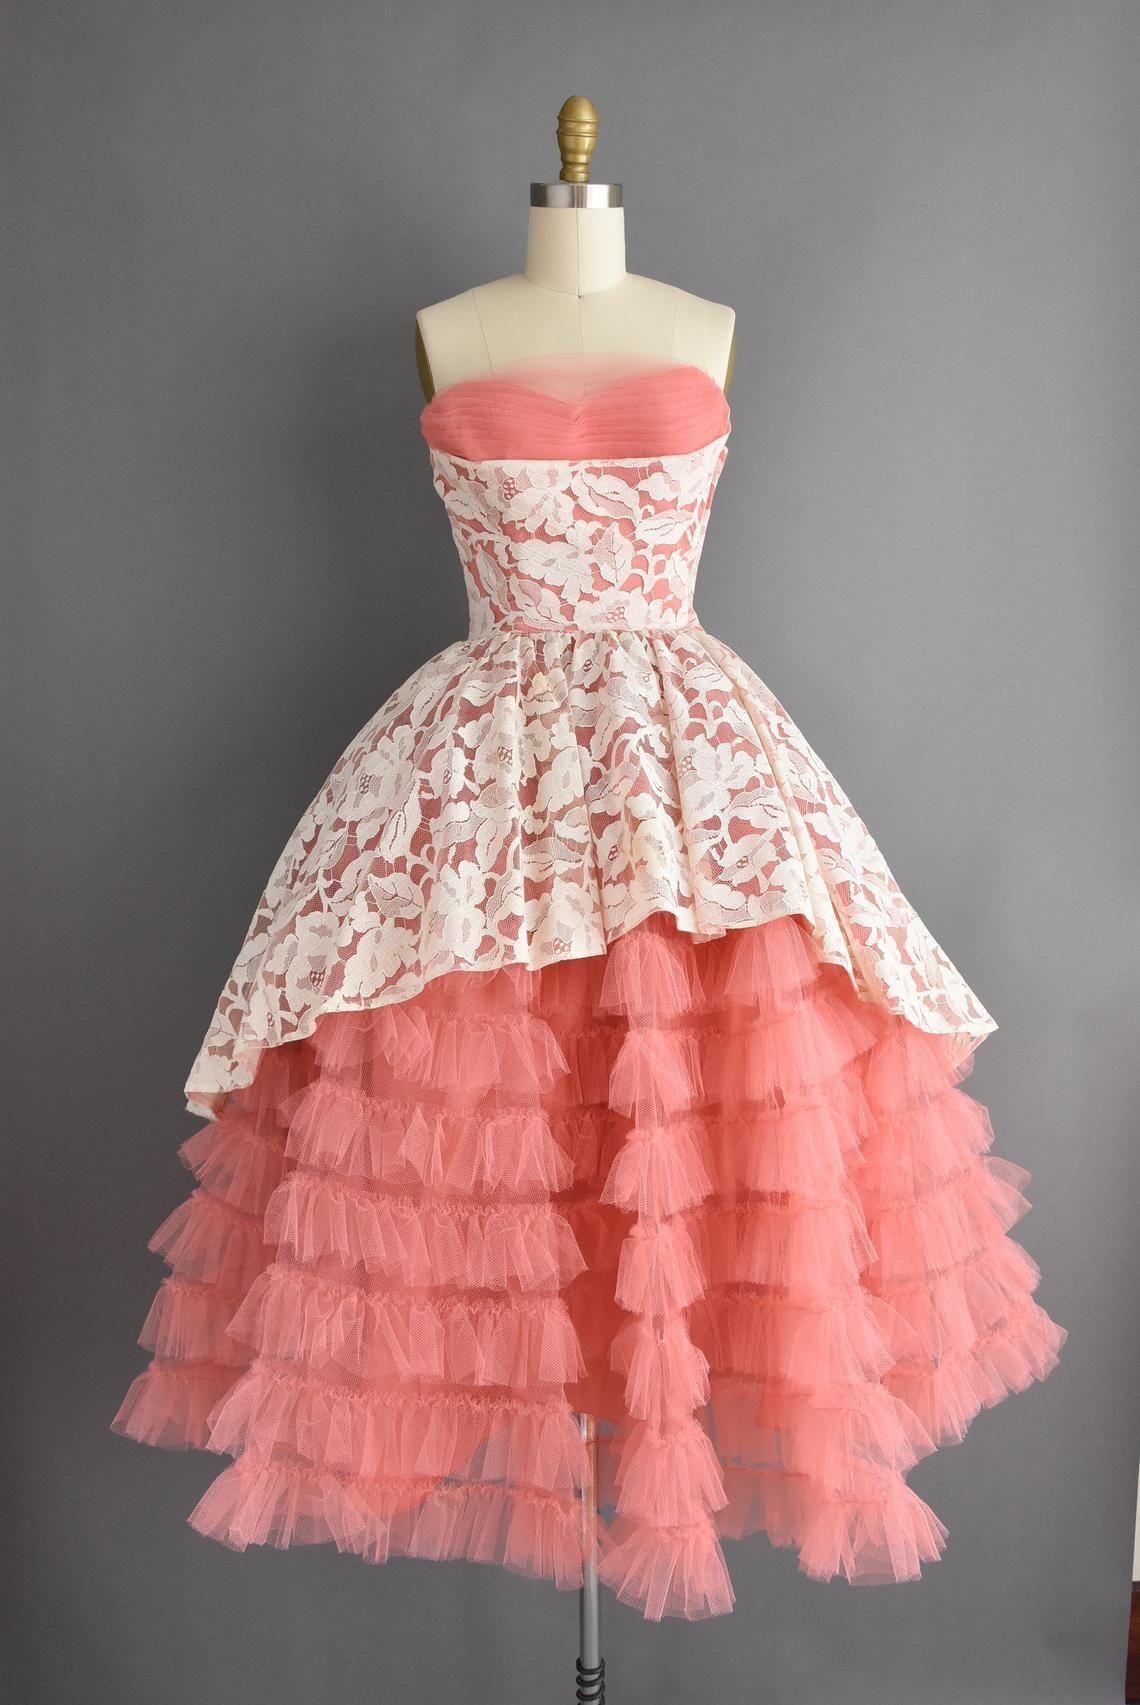 50s Vintage Dress Gorgeous Strapless Pink Ruffle Tulle Etsy Vintage Dresses 50s Vintage 1950s Dresses Dresses [ 1705 x 1140 Pixel ]